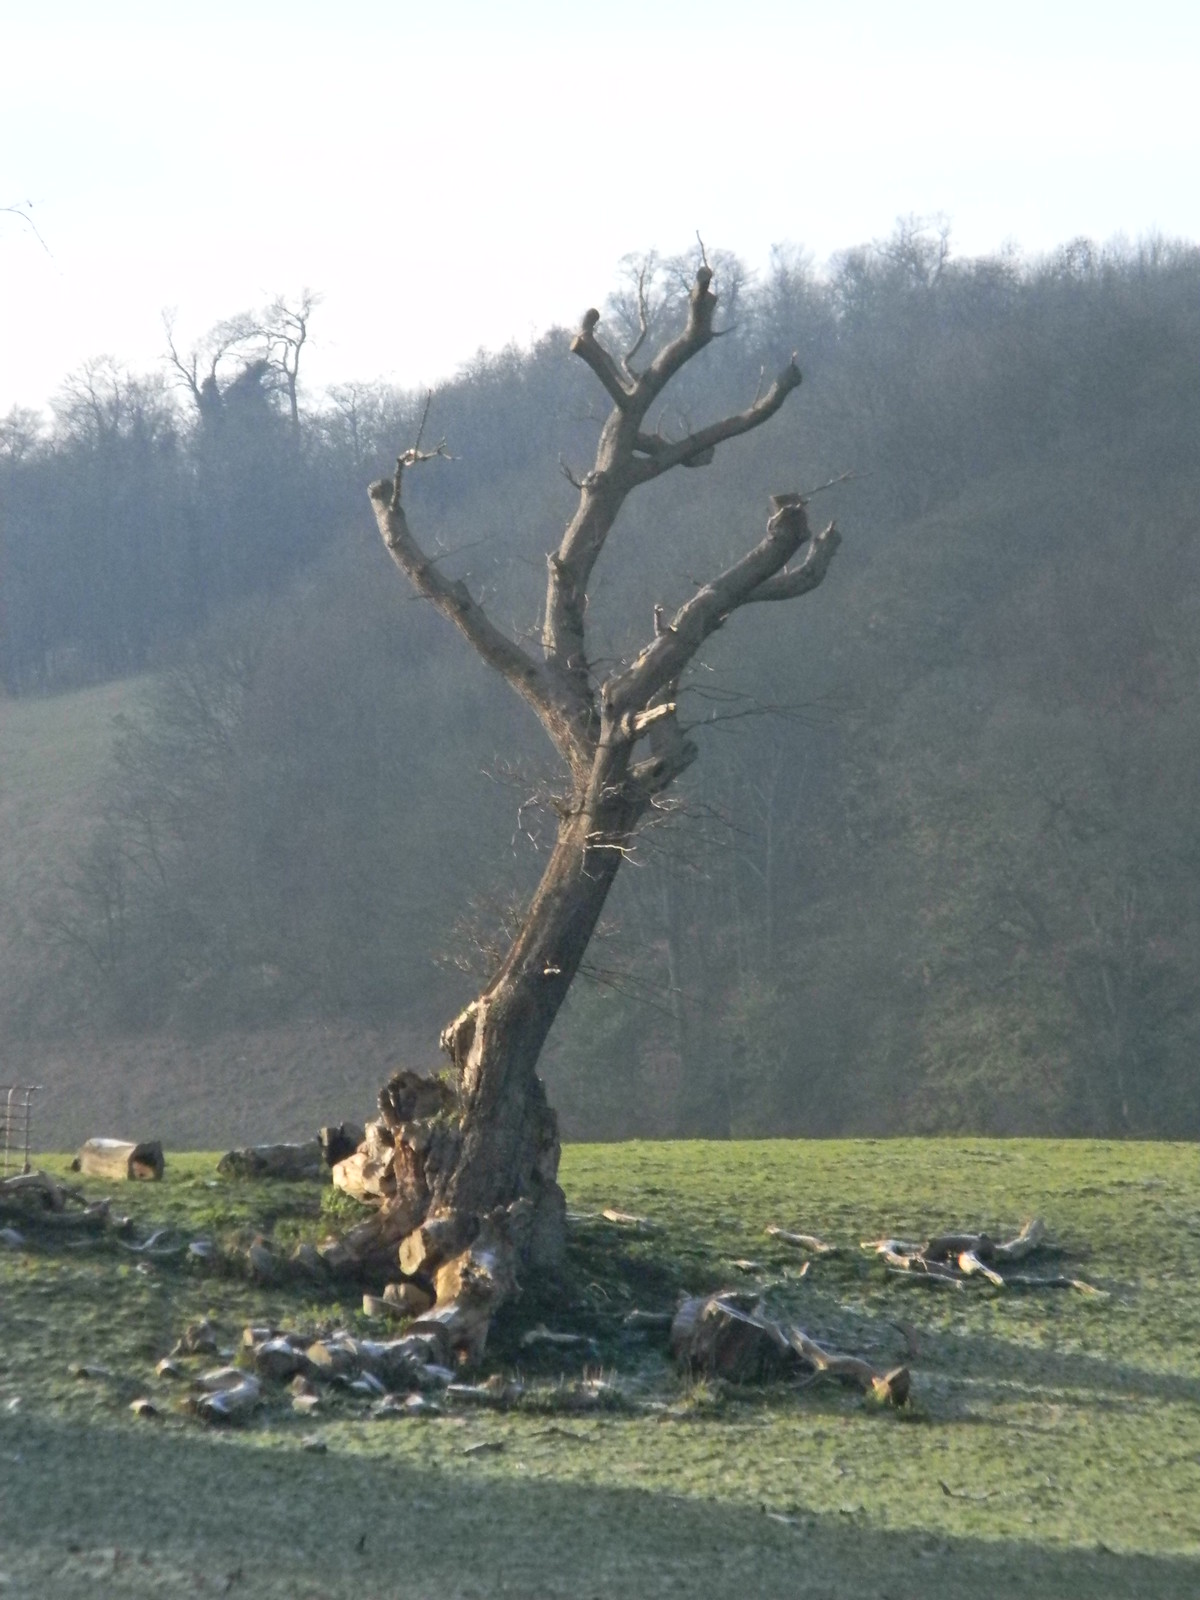 Distinctive stump Just needs a vulture sitting on it. Merstham to Tadworth